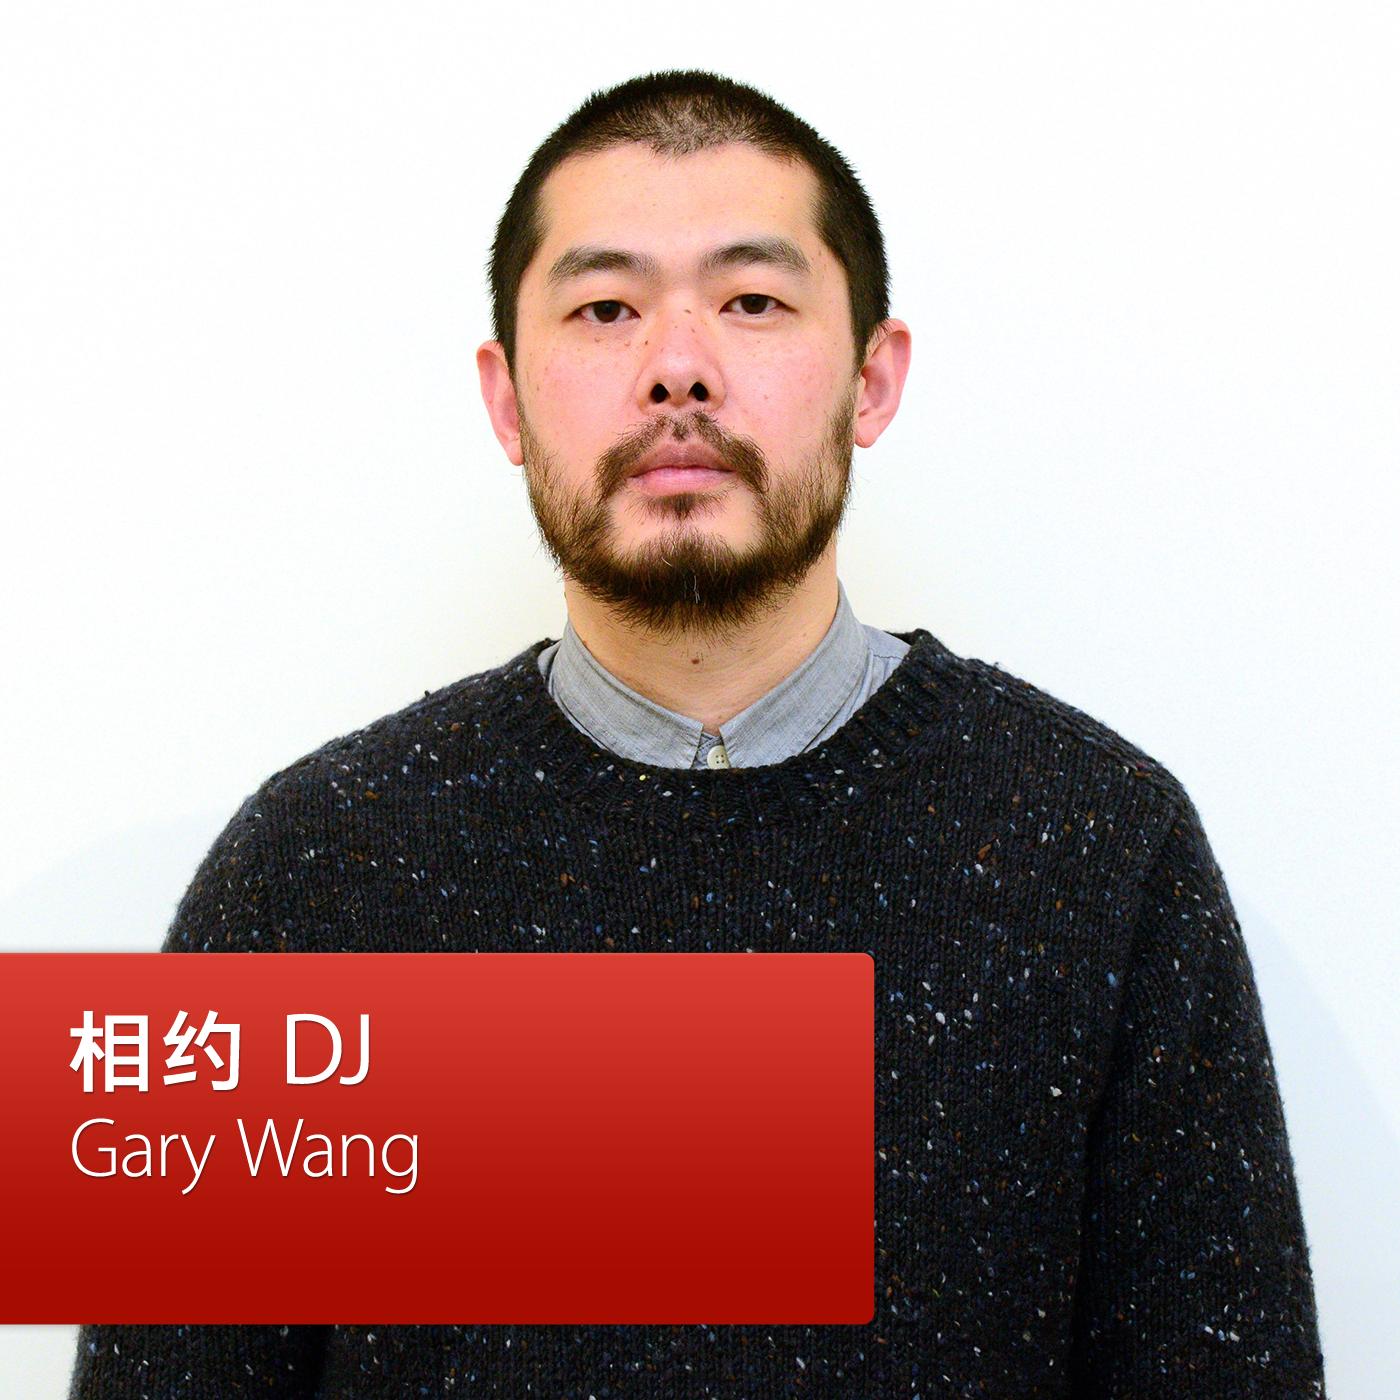 Gary Wang: 相约 DJ